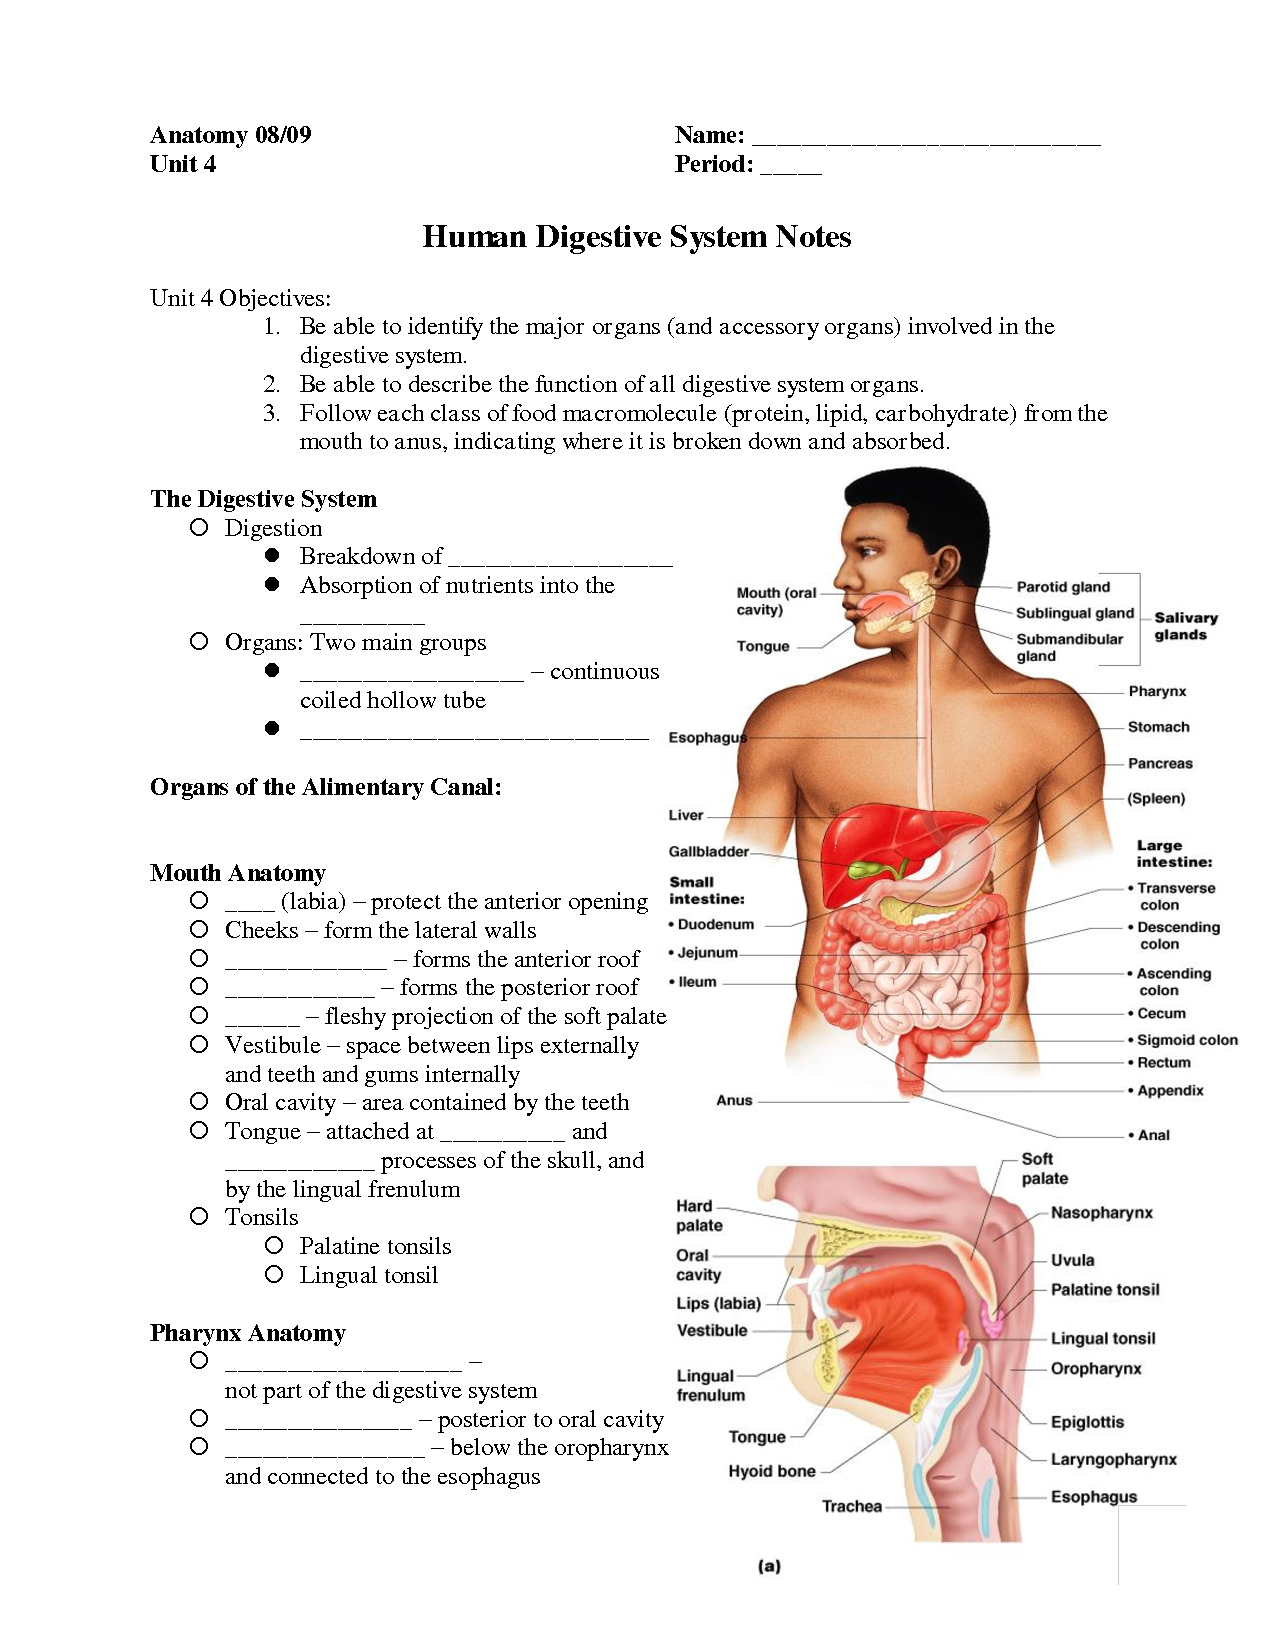 Internal Anatomy Chart Organs of Human Body | www.sinoalgerie.com ...